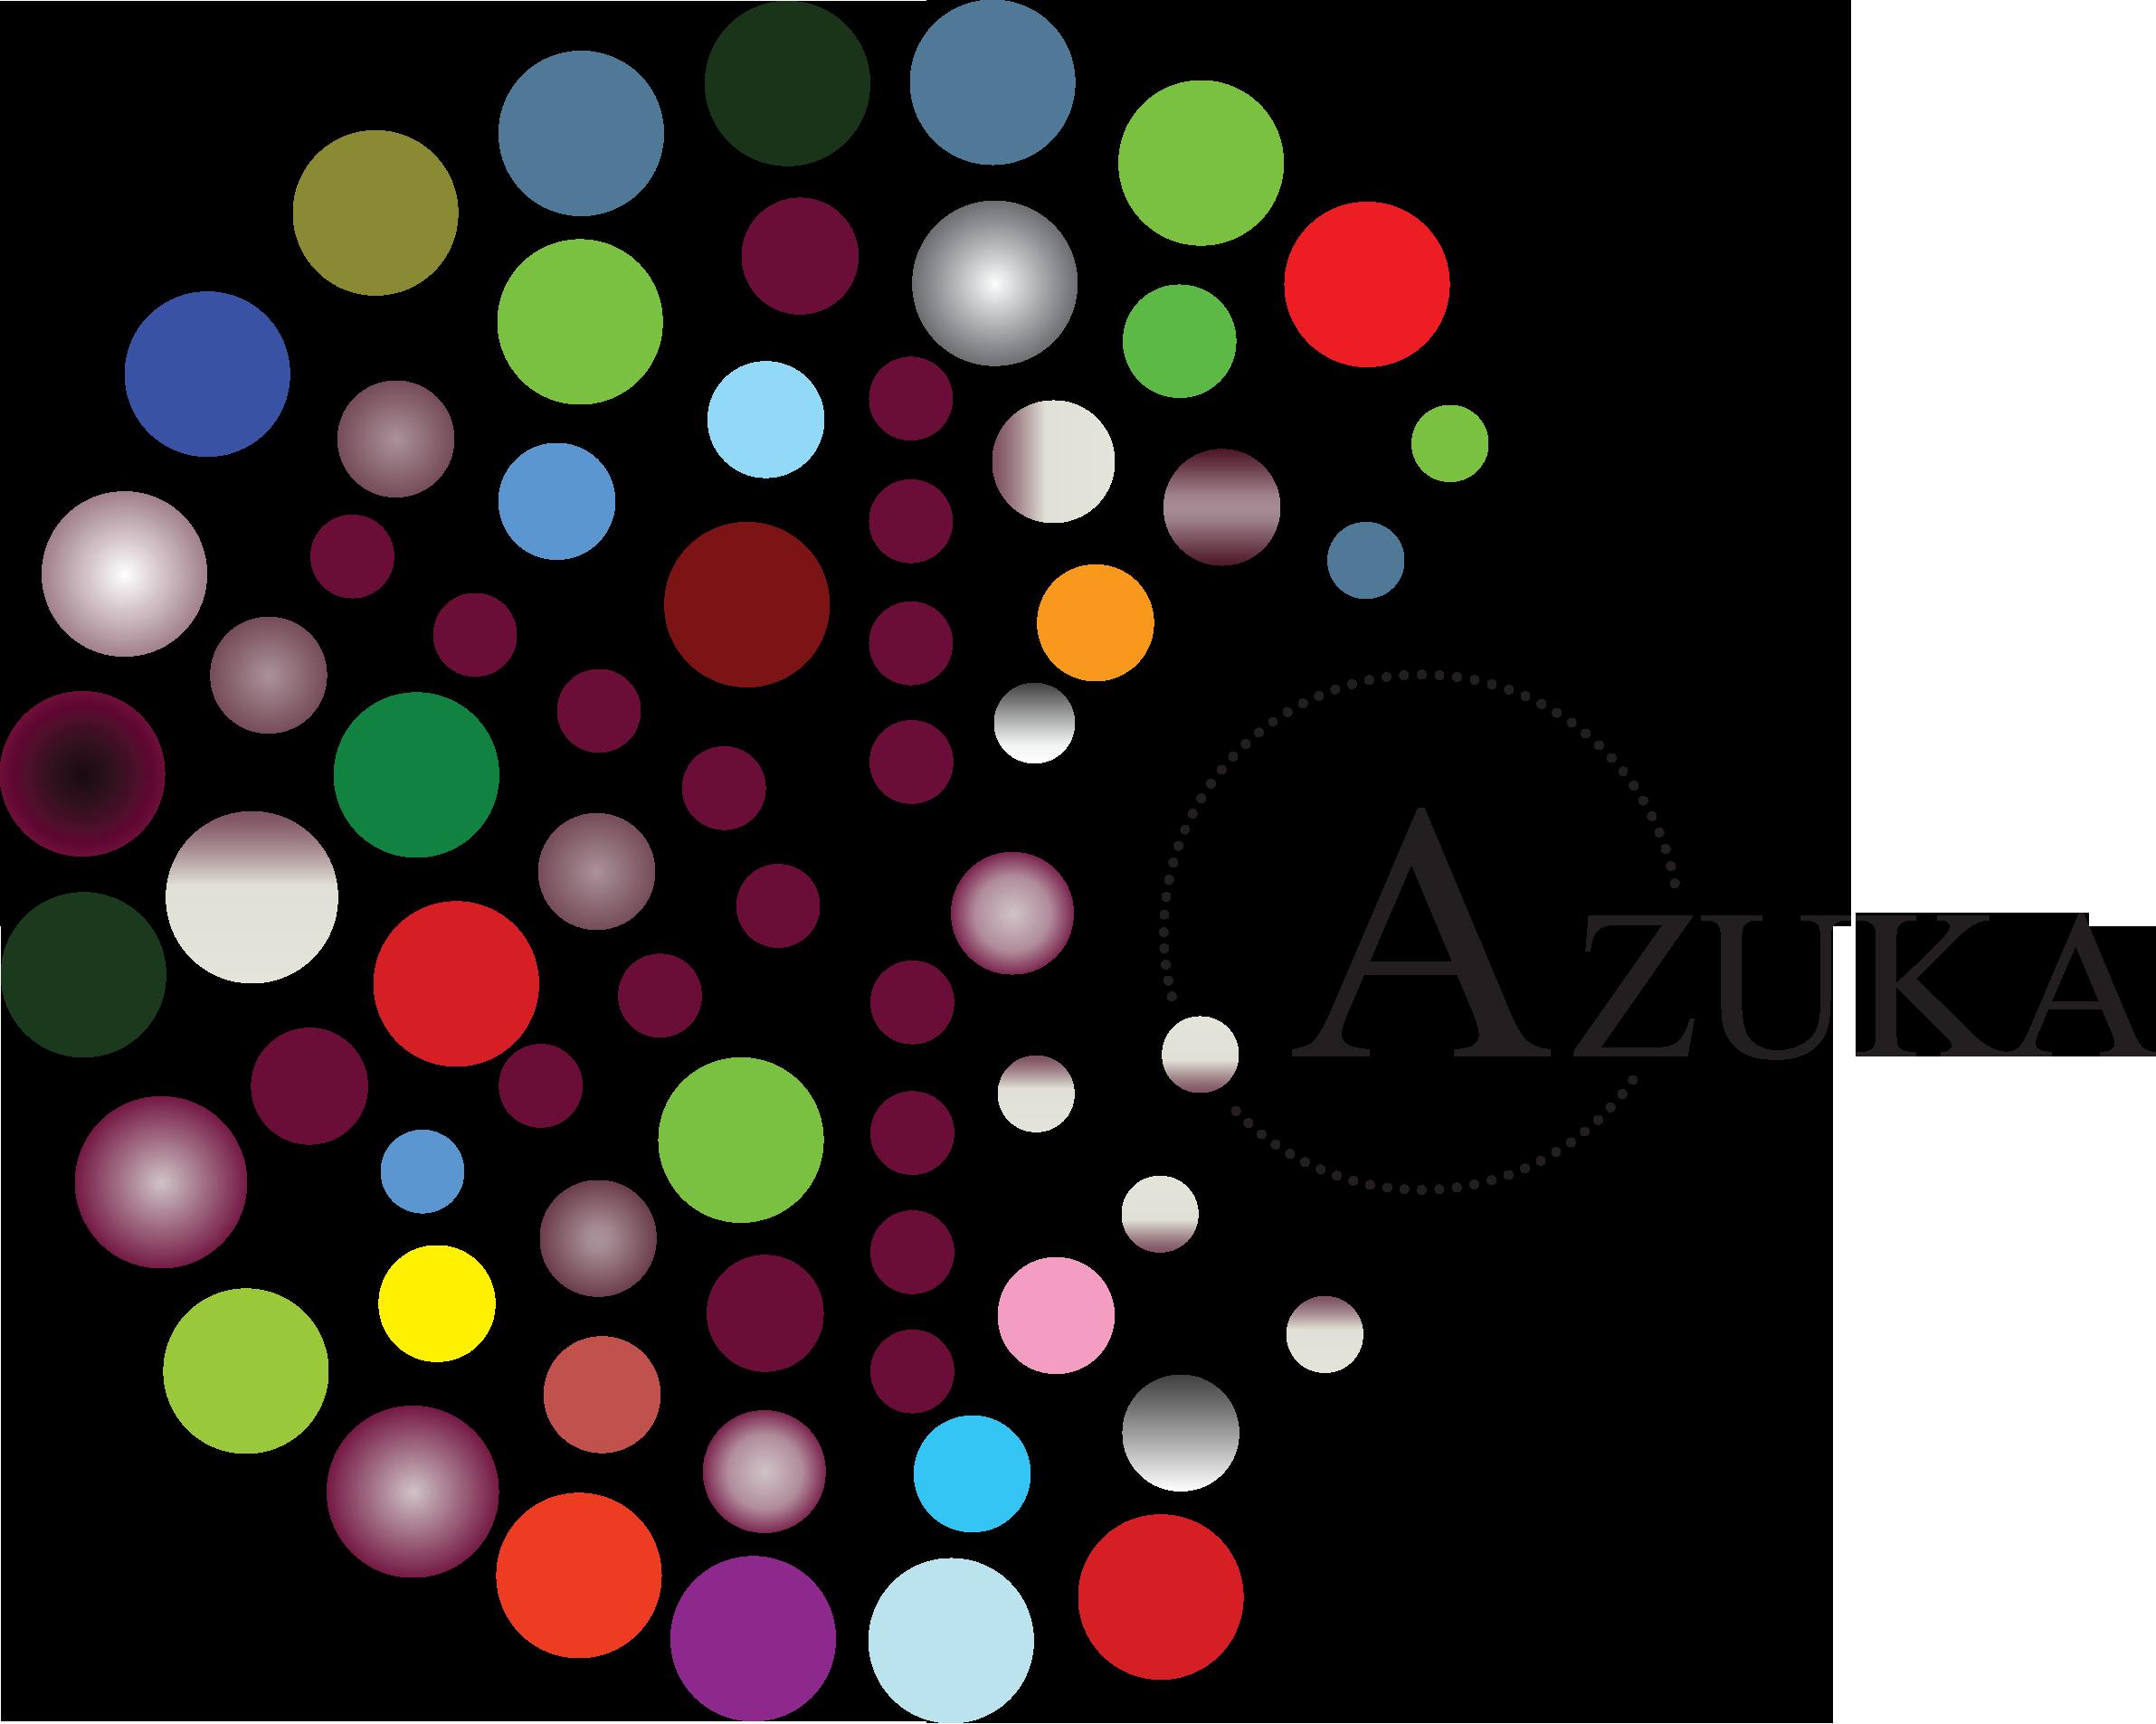 AZUKA_SQUARE_BLK-3